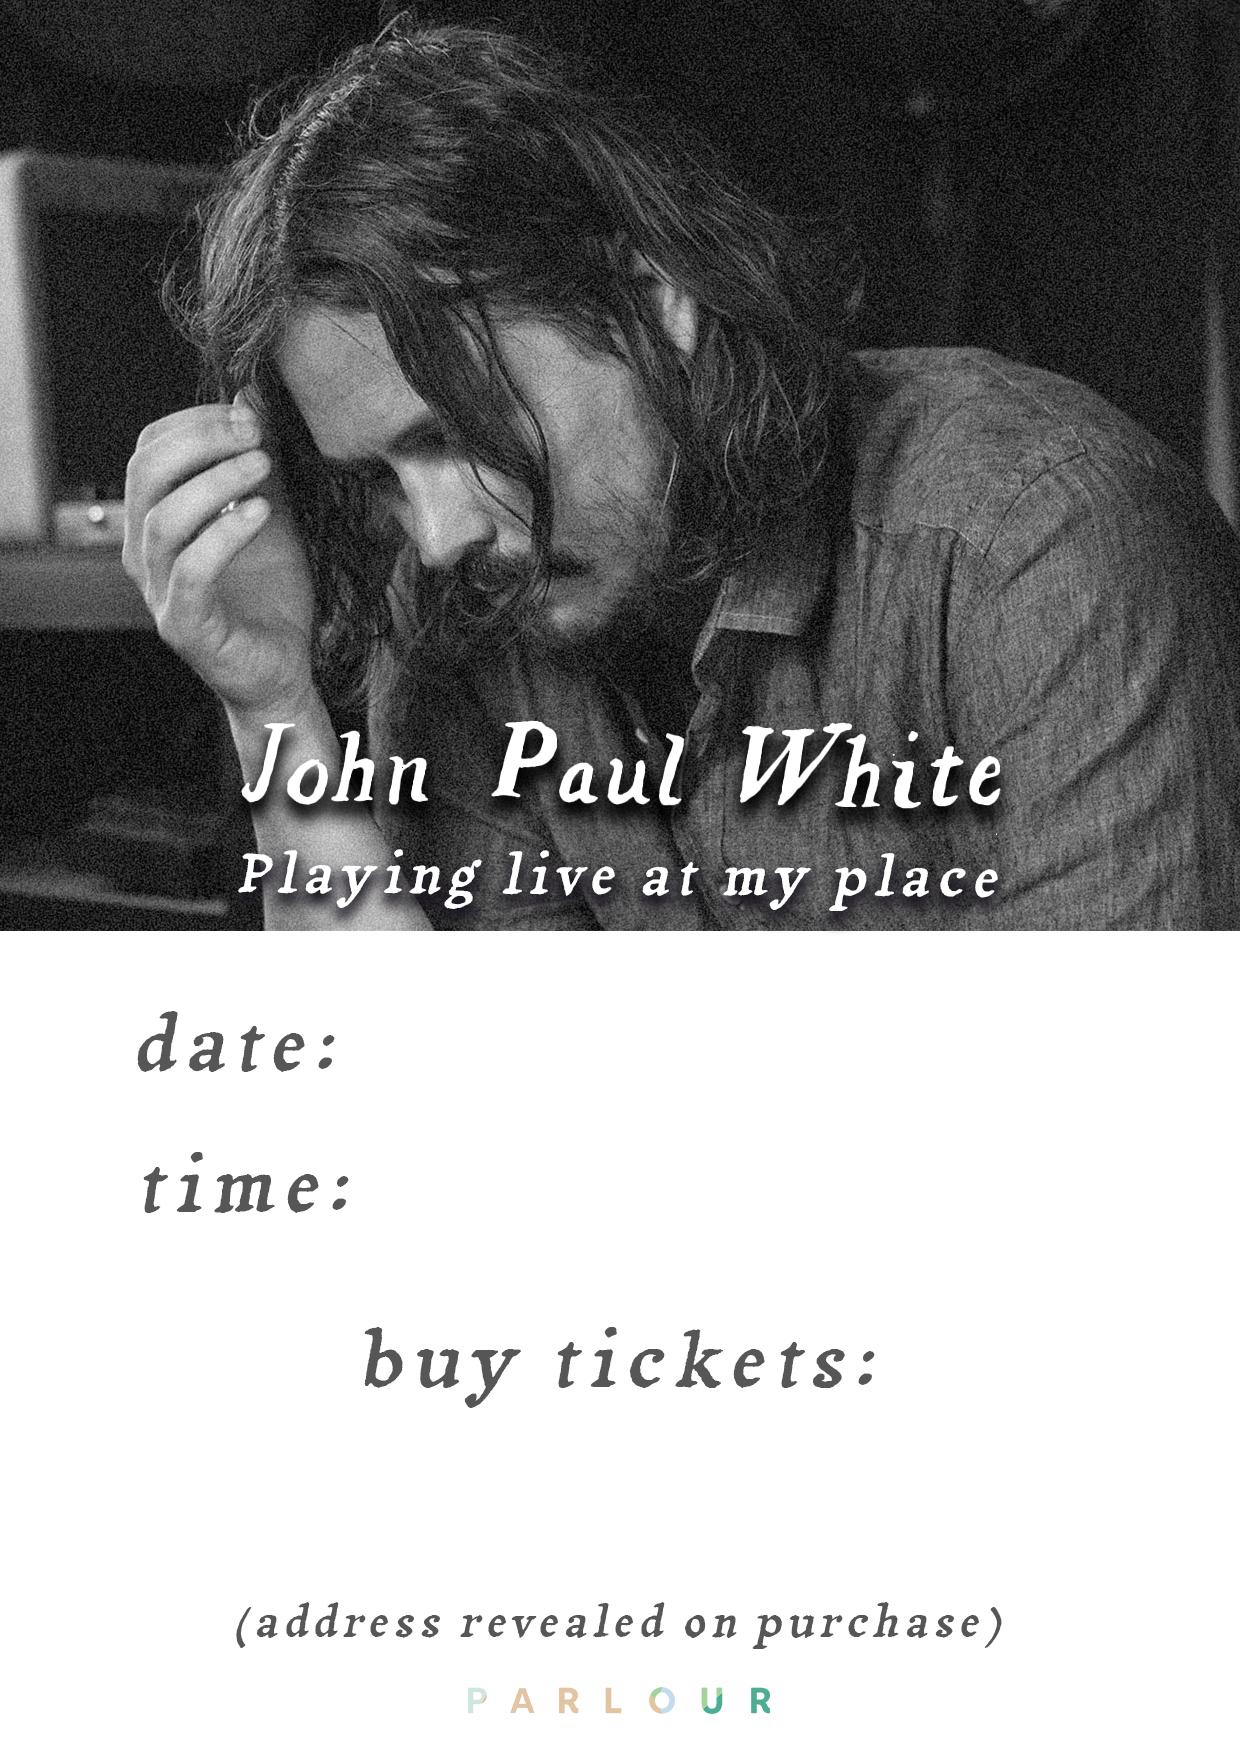 JPW Poster.jpg